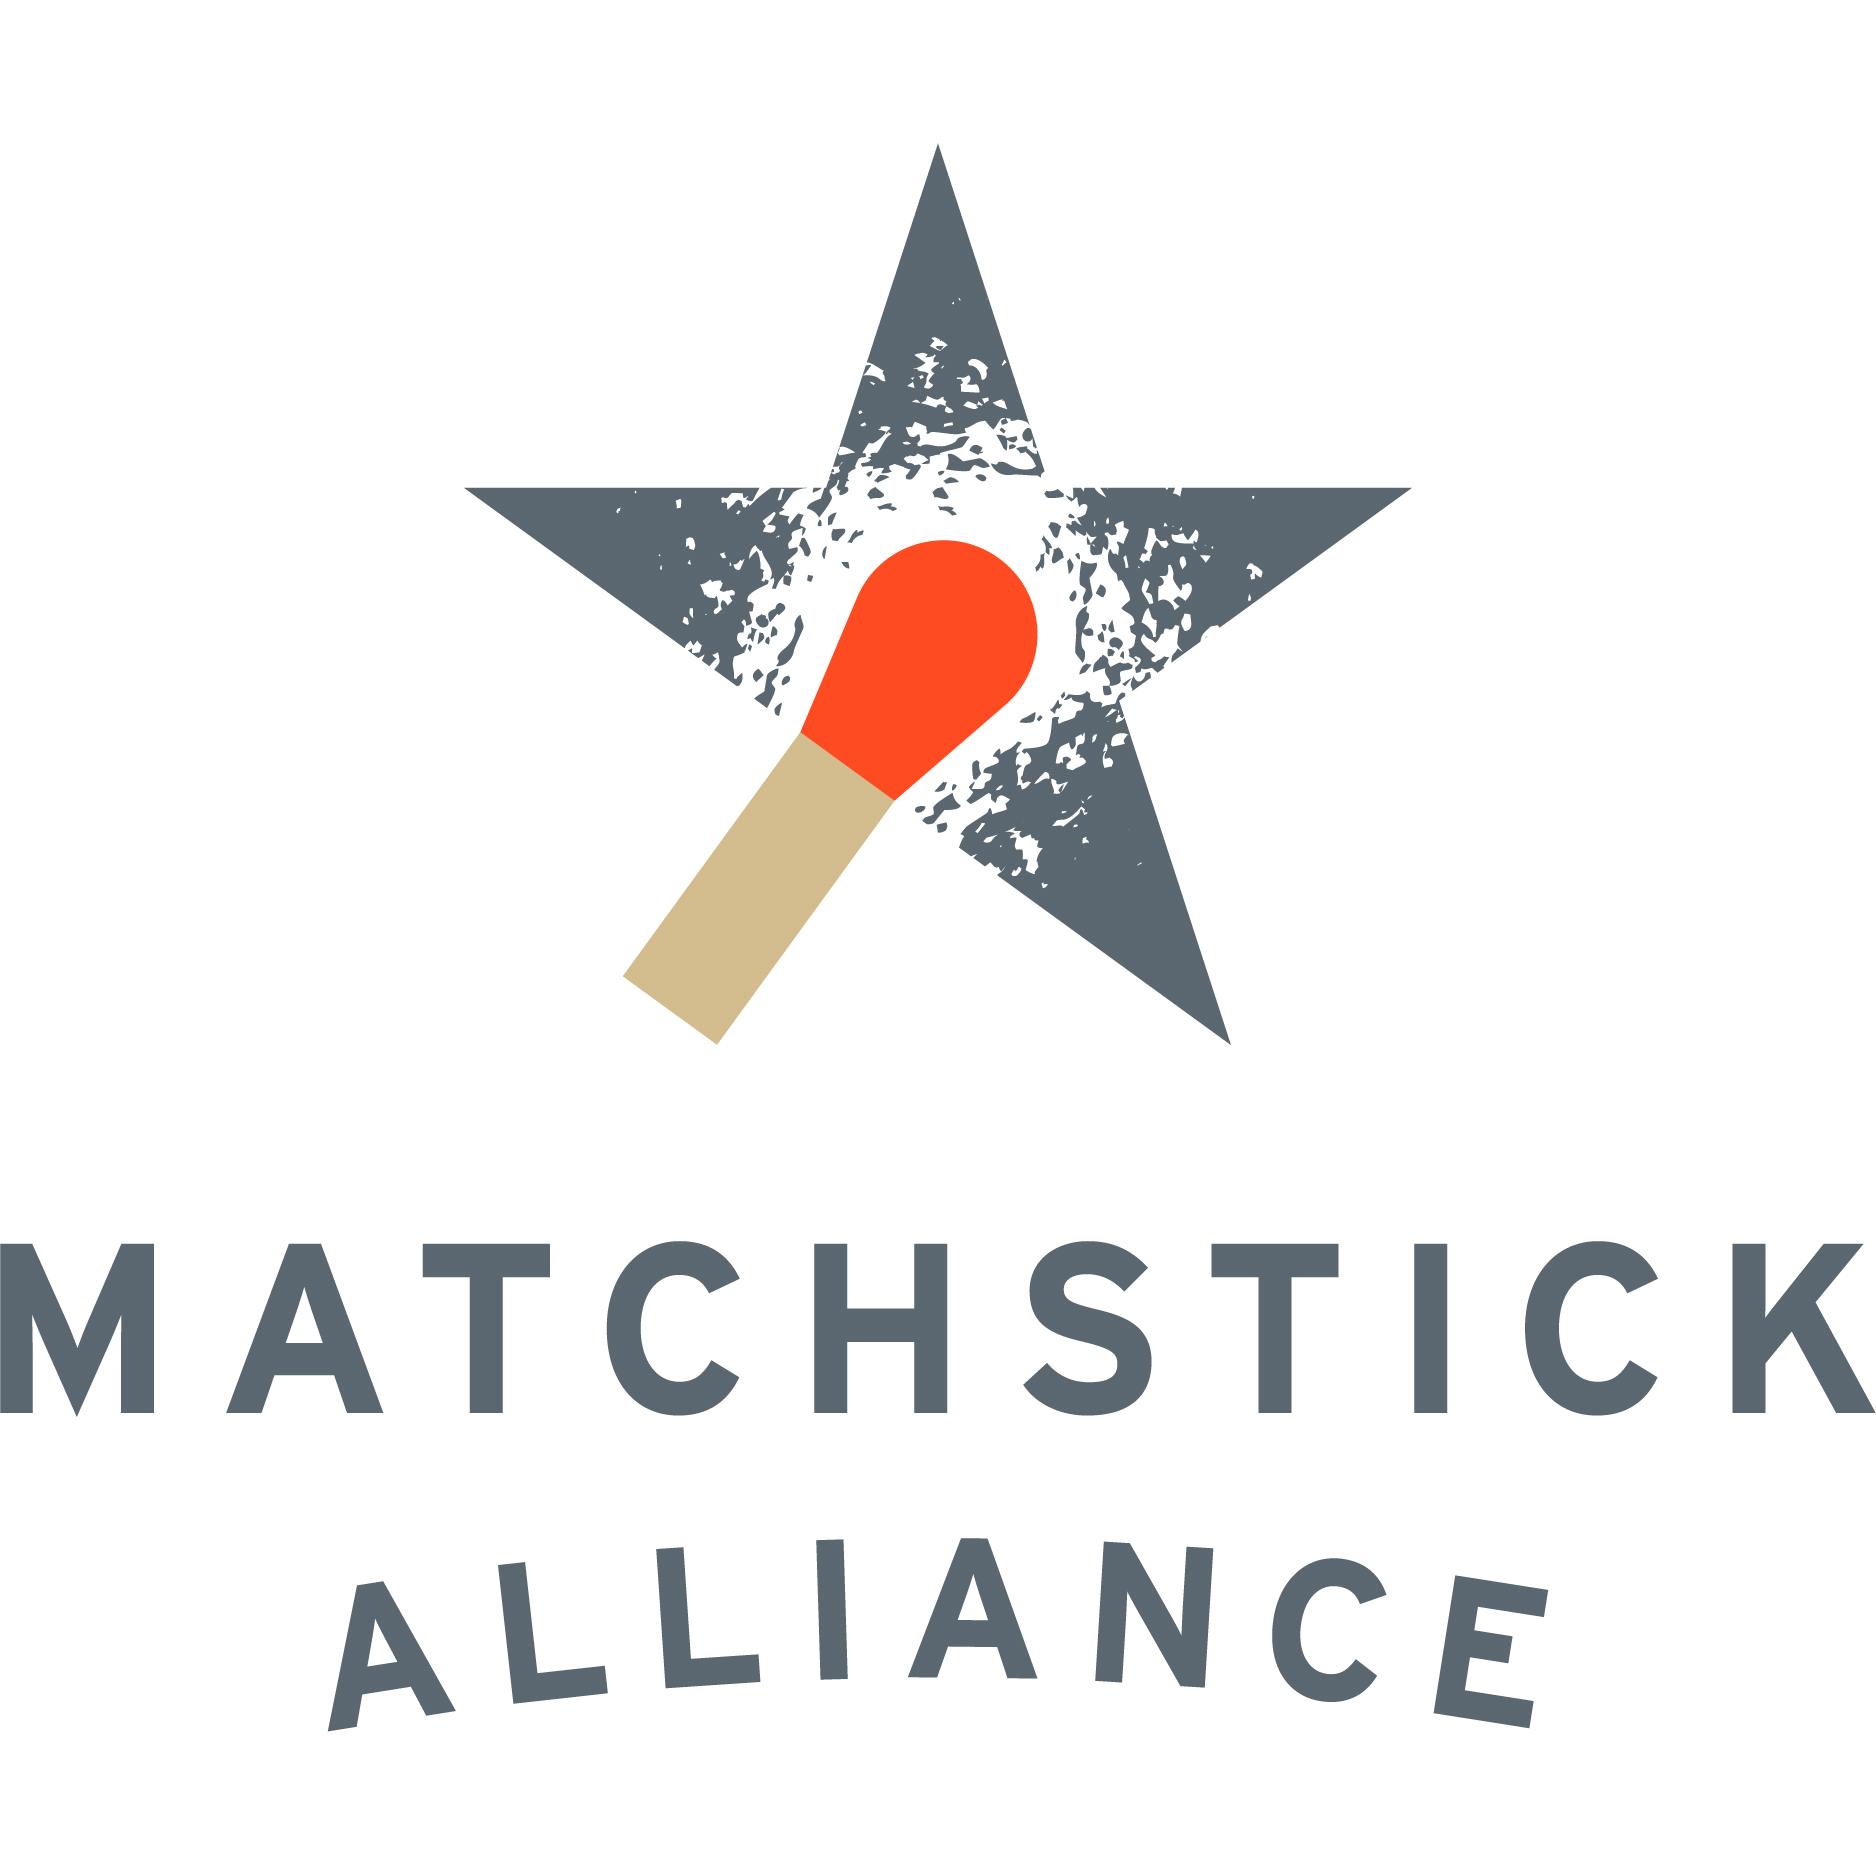 Matchstick Alliance logo design by logo designer Gardner Design for your inspiration and for the worlds largest logo competition